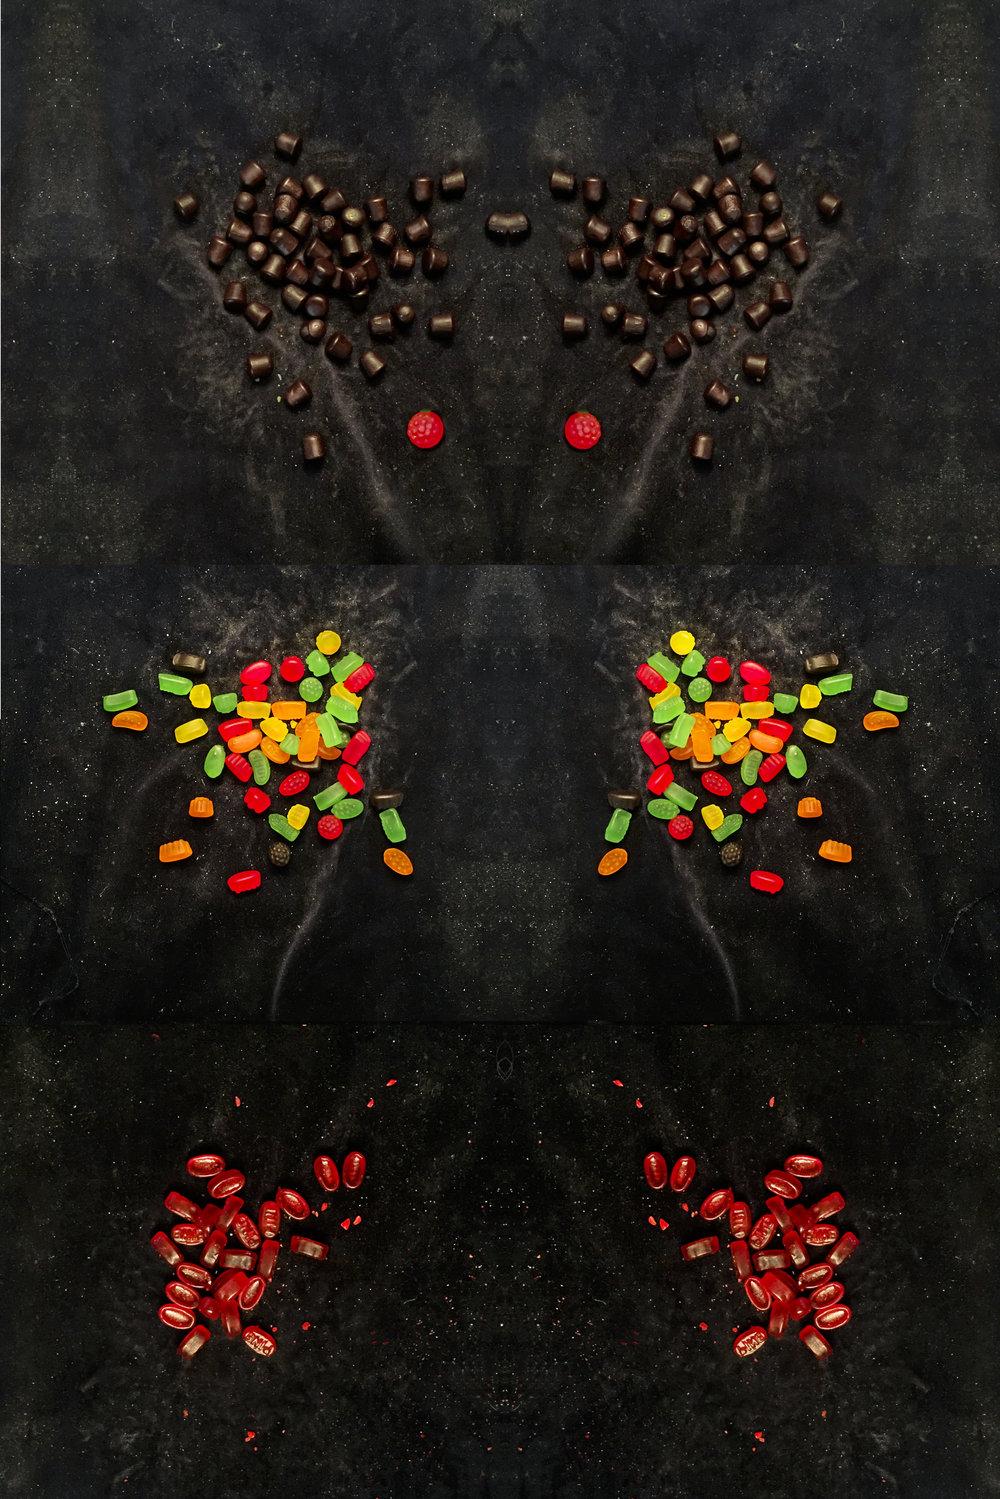 Candyman 2017